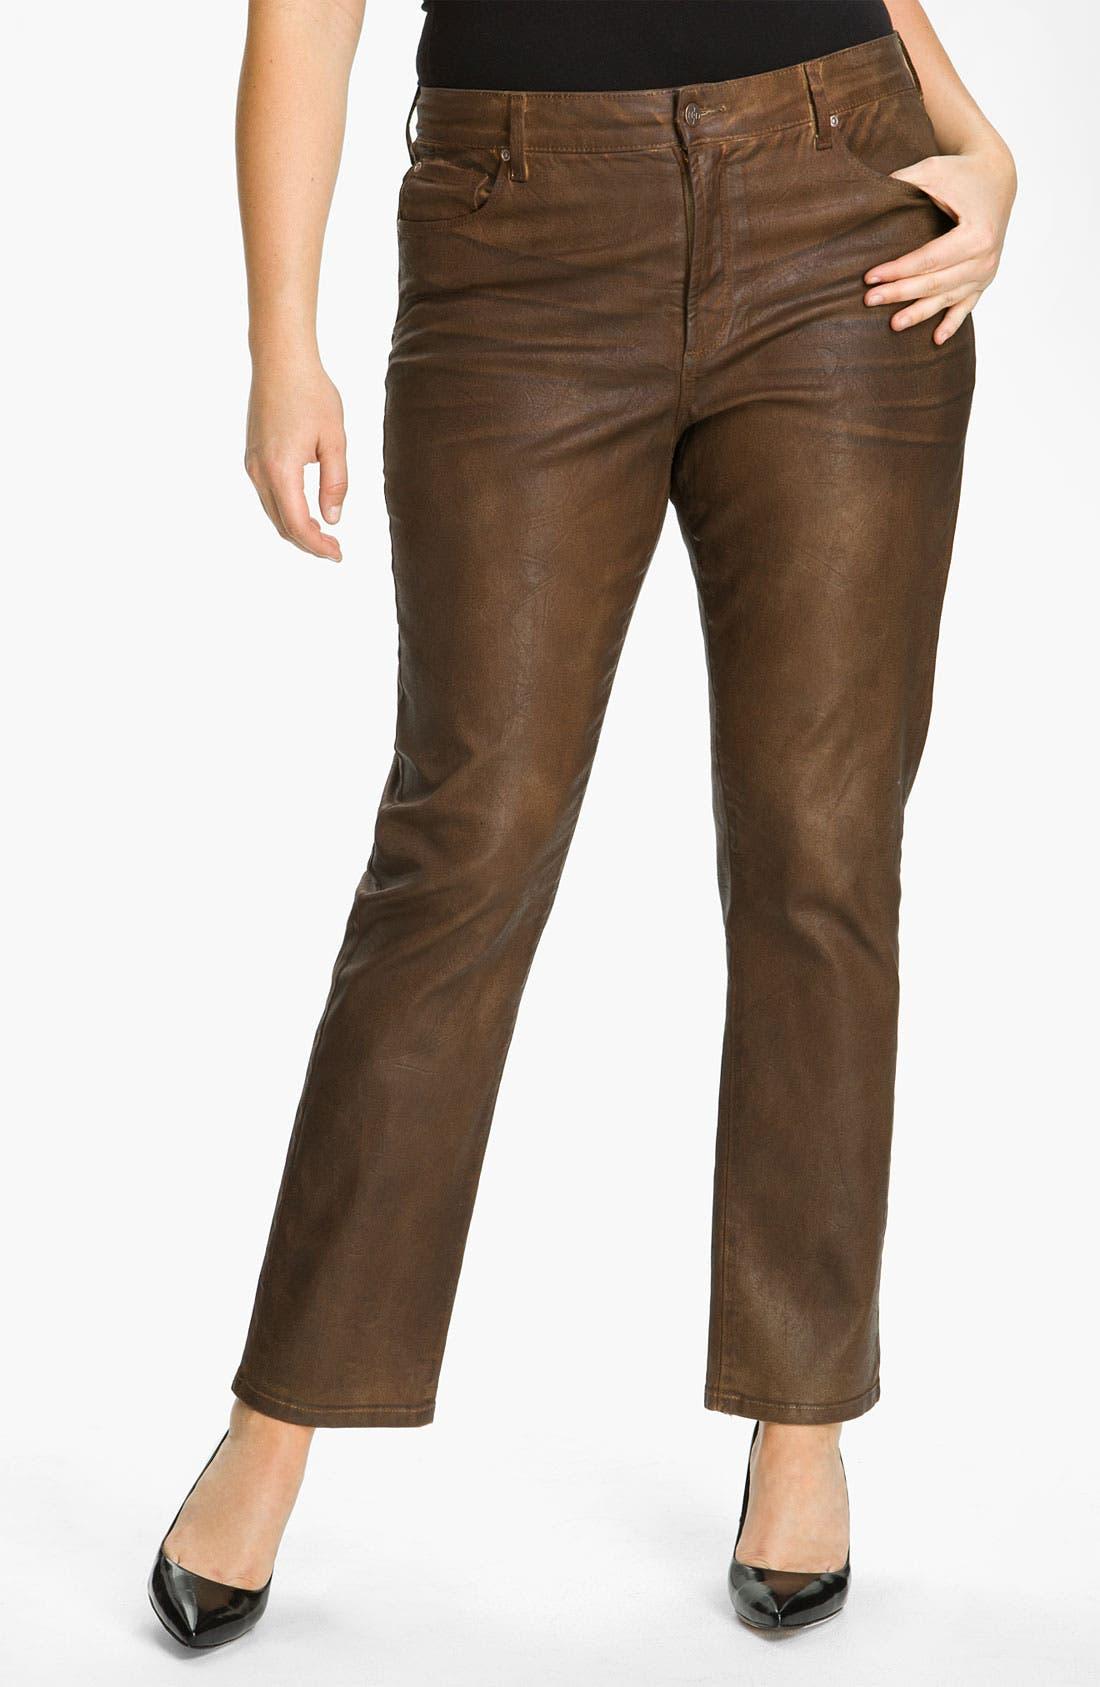 Main Image - NYDJ 'Sheri' Skinny Terra Hide Jeans (Plus)